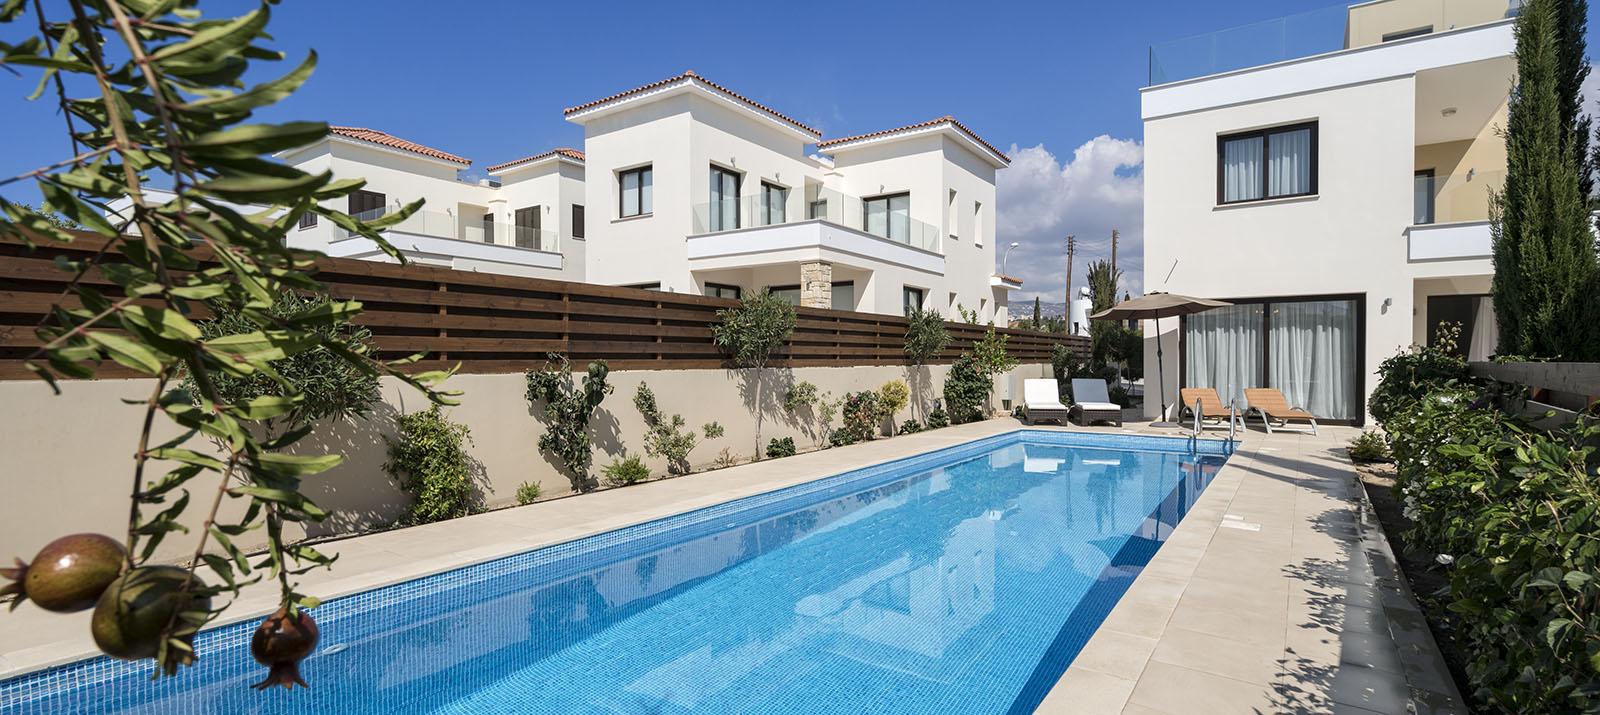 Cyprus Holiday Villa 519351